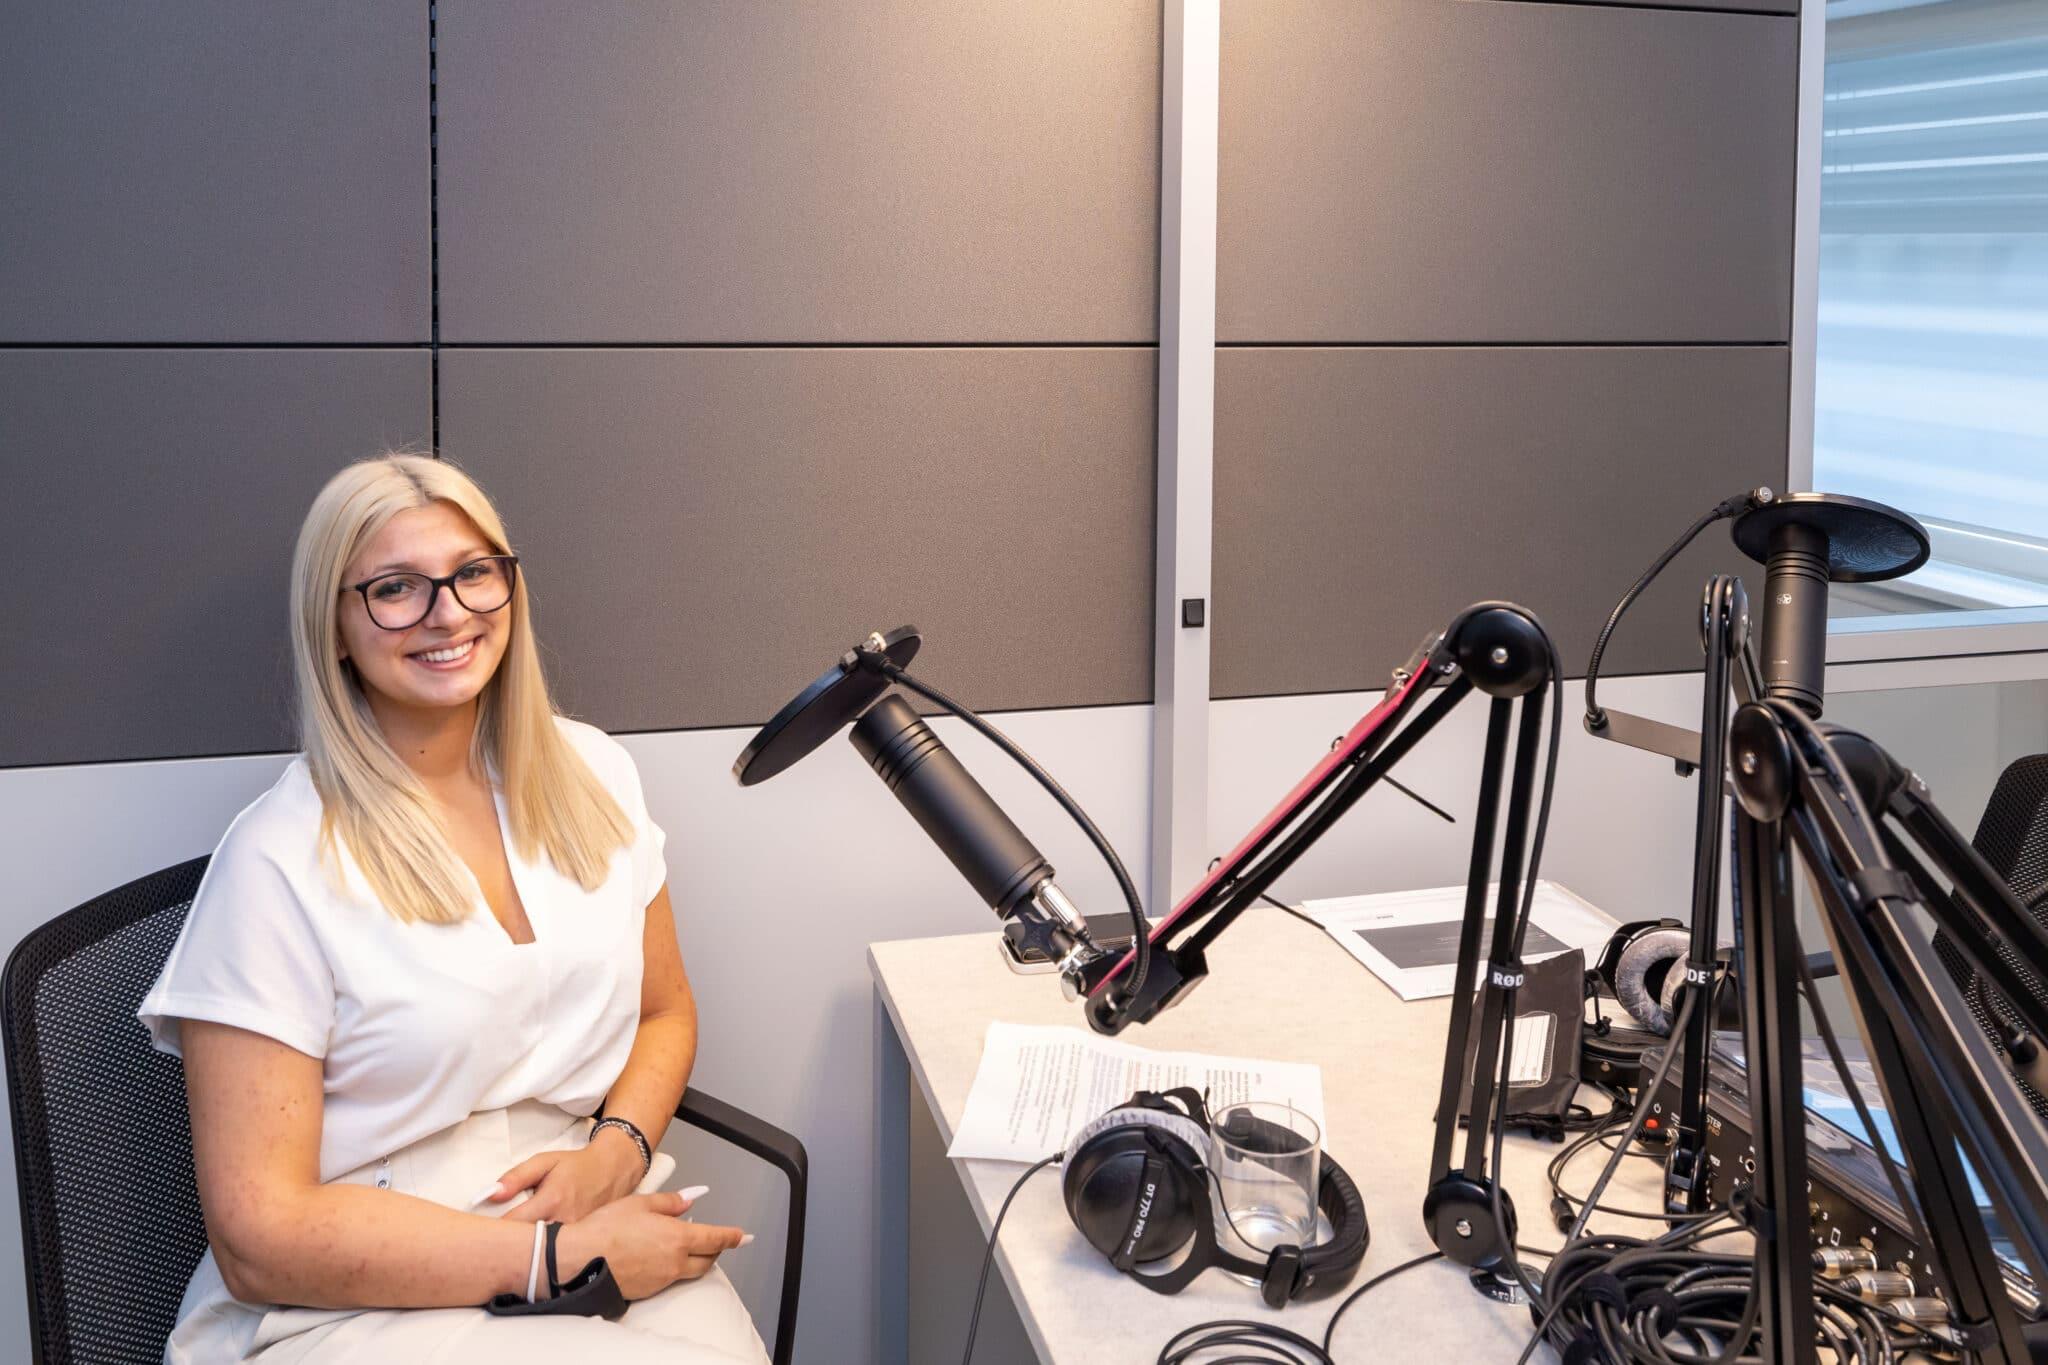 Aleksandra Stevic im Podcast-Studio